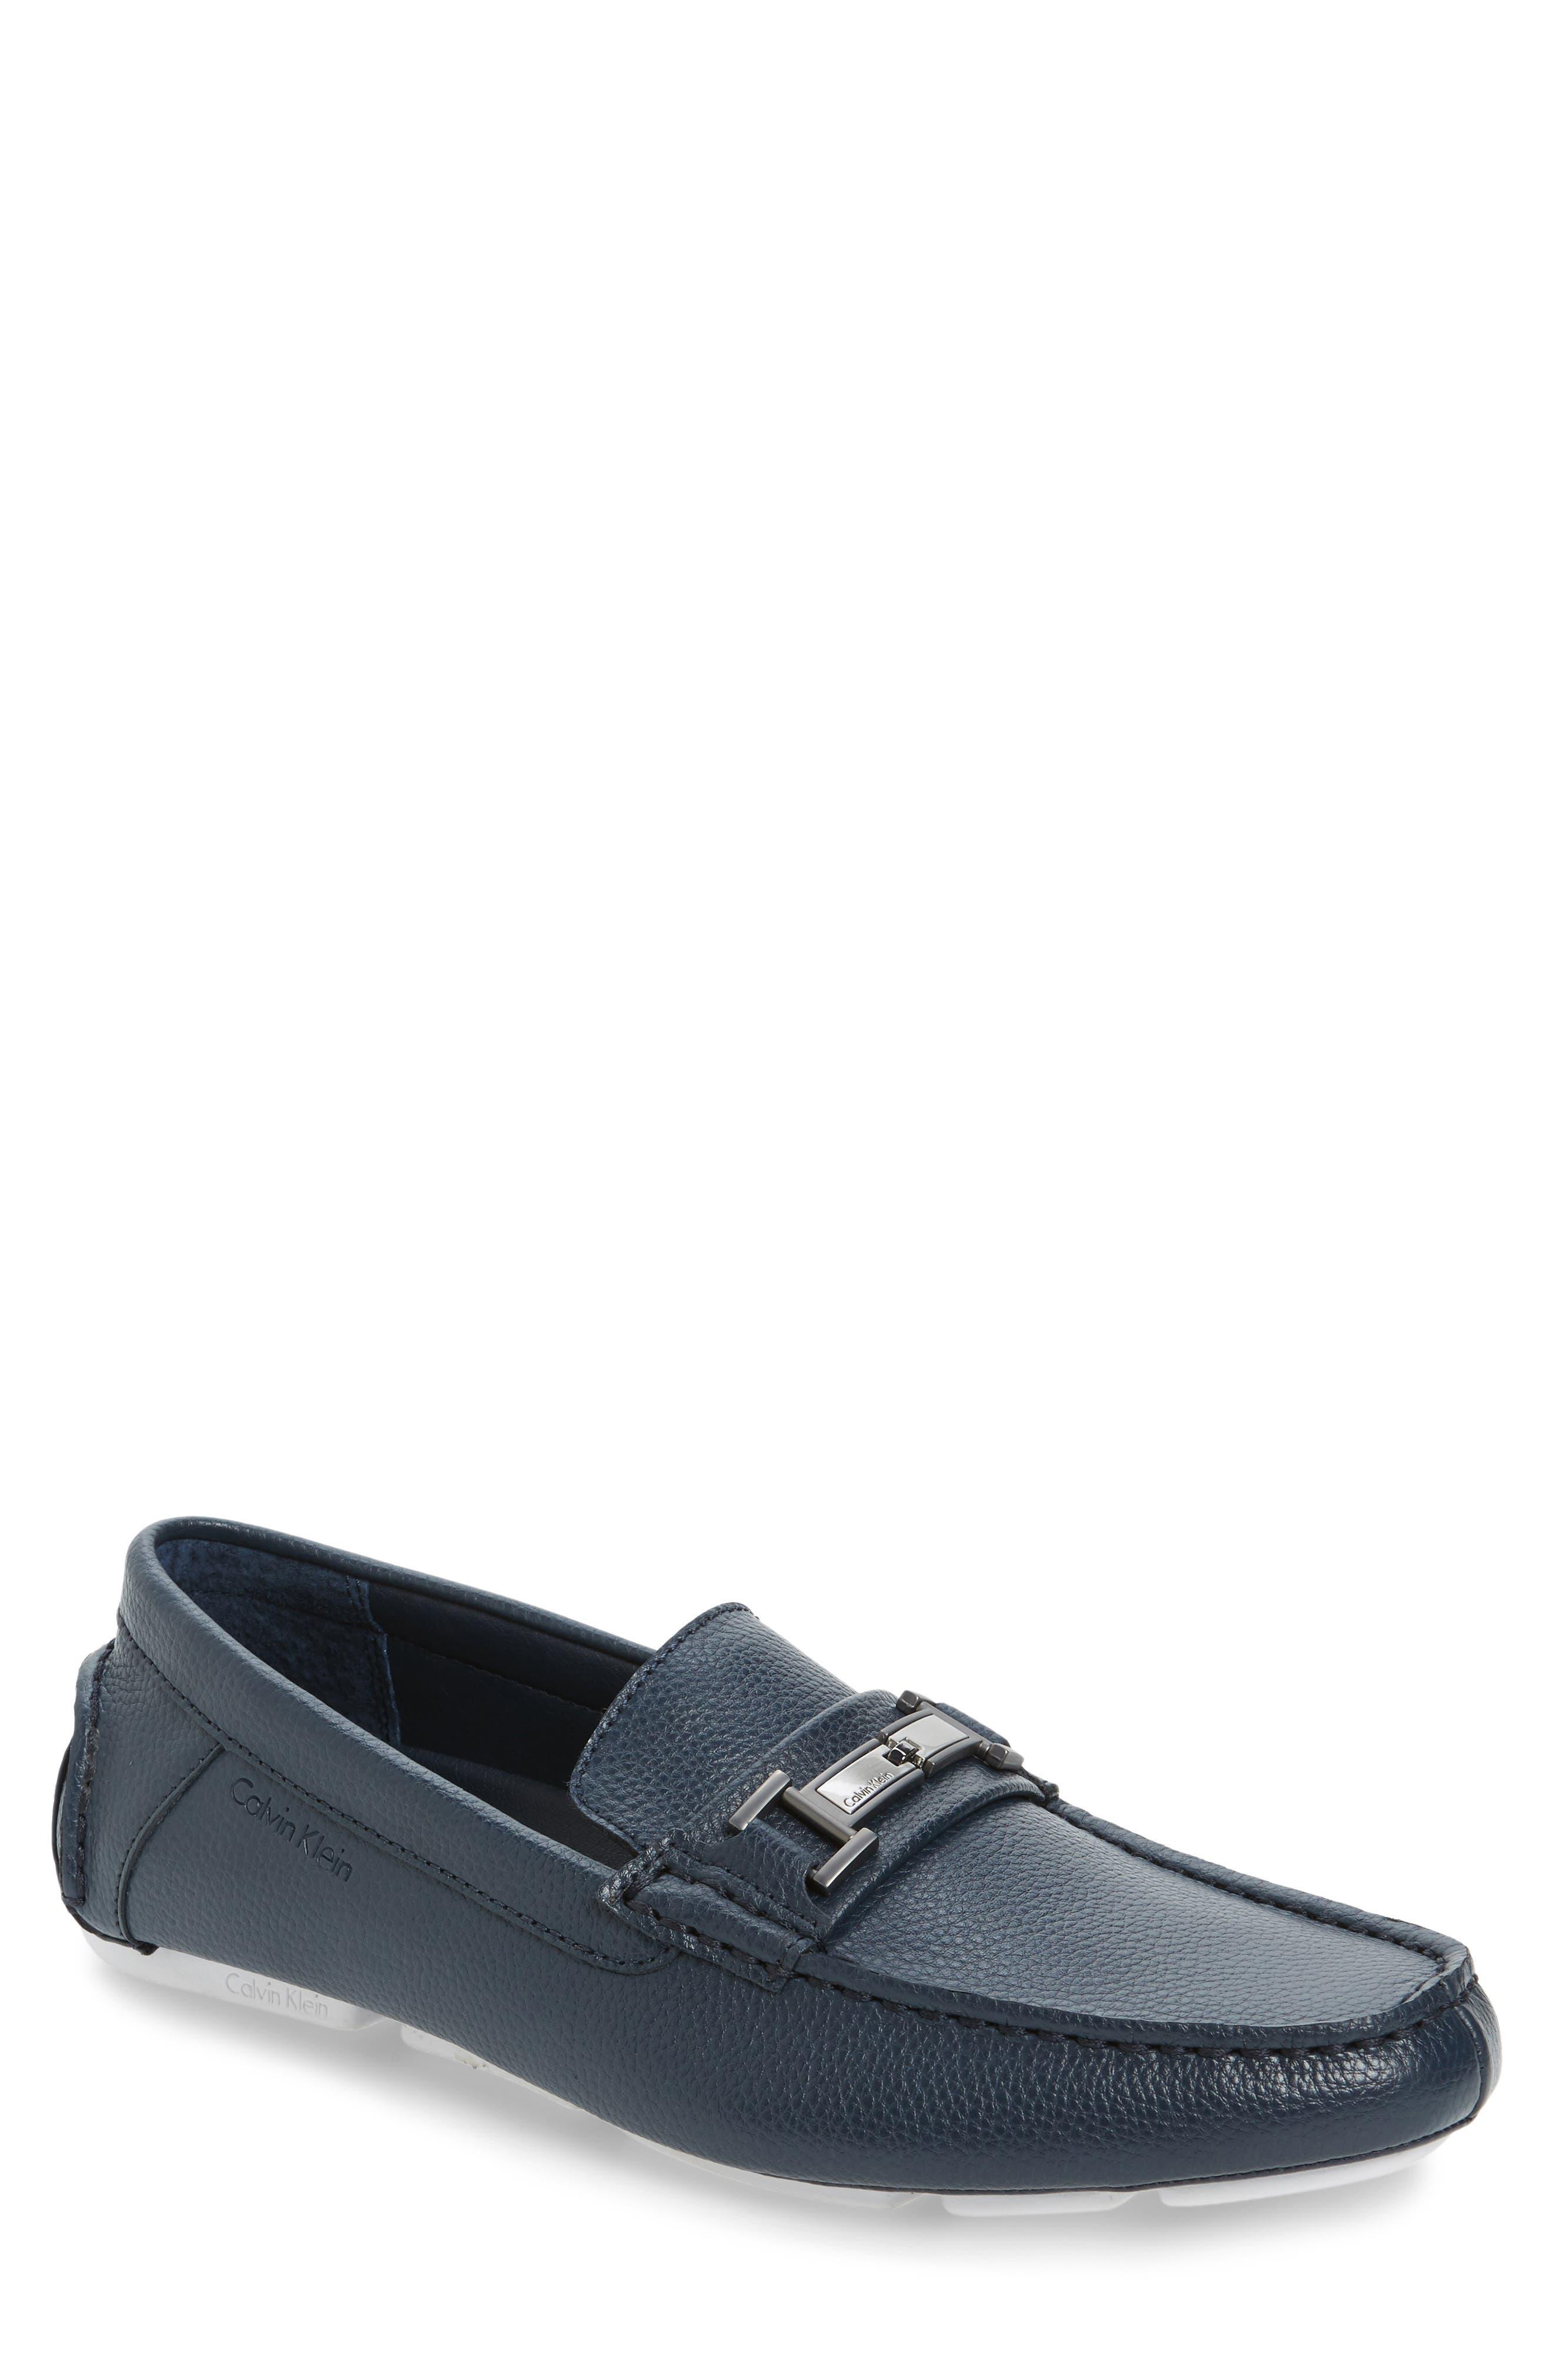 Alternate Image 1 Selected - Calvin Klein Magnus Driving Shoe (Men)